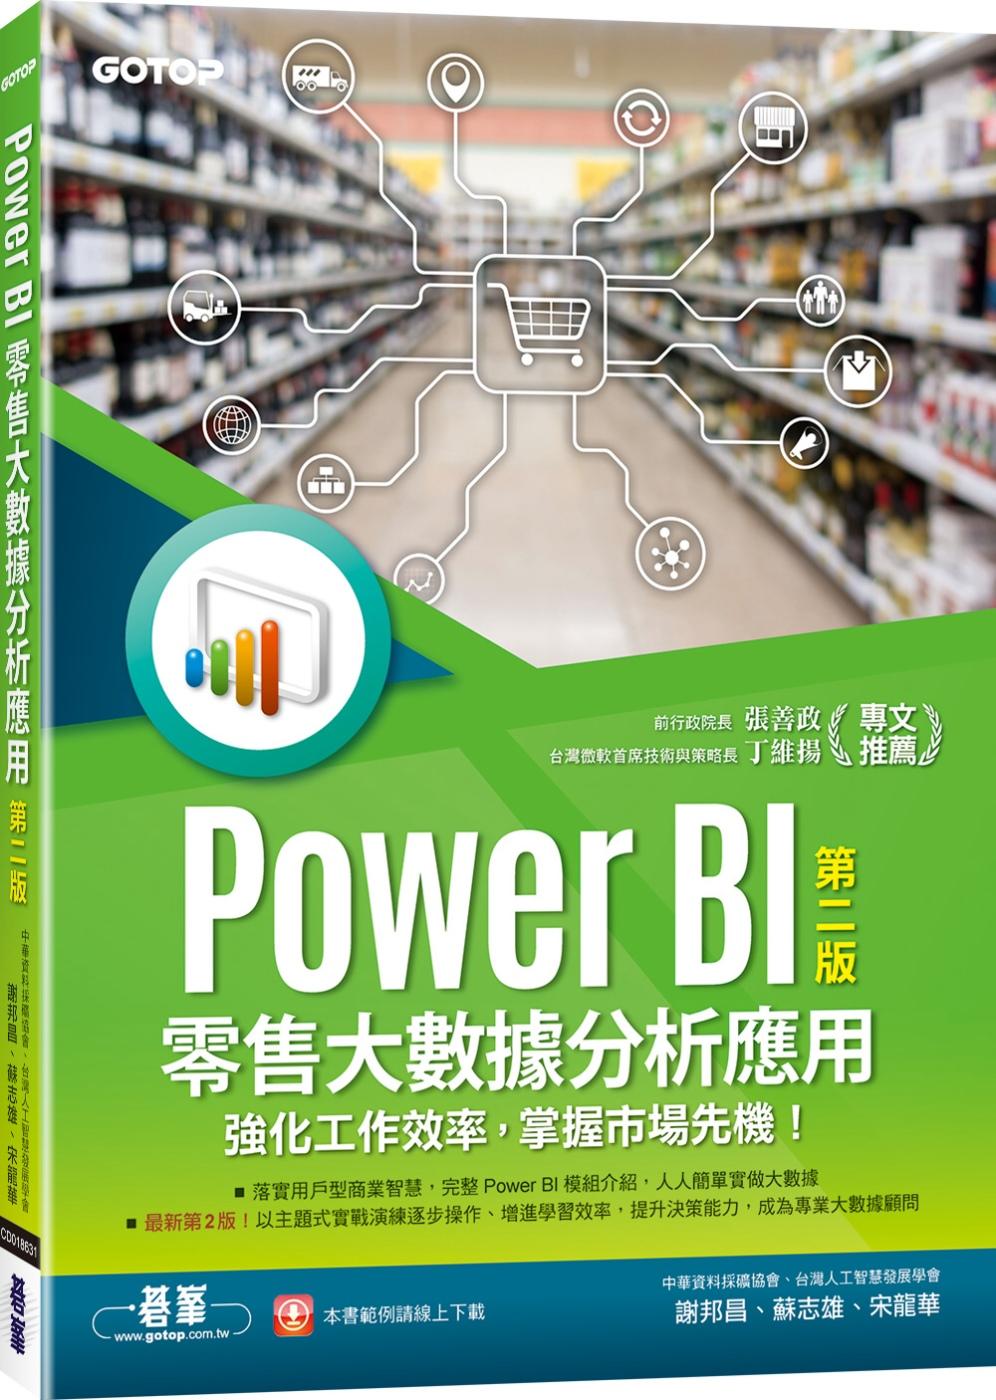 Power BI零售大數據分析應用:強化工作效率,掌握市場先機!(第二版)